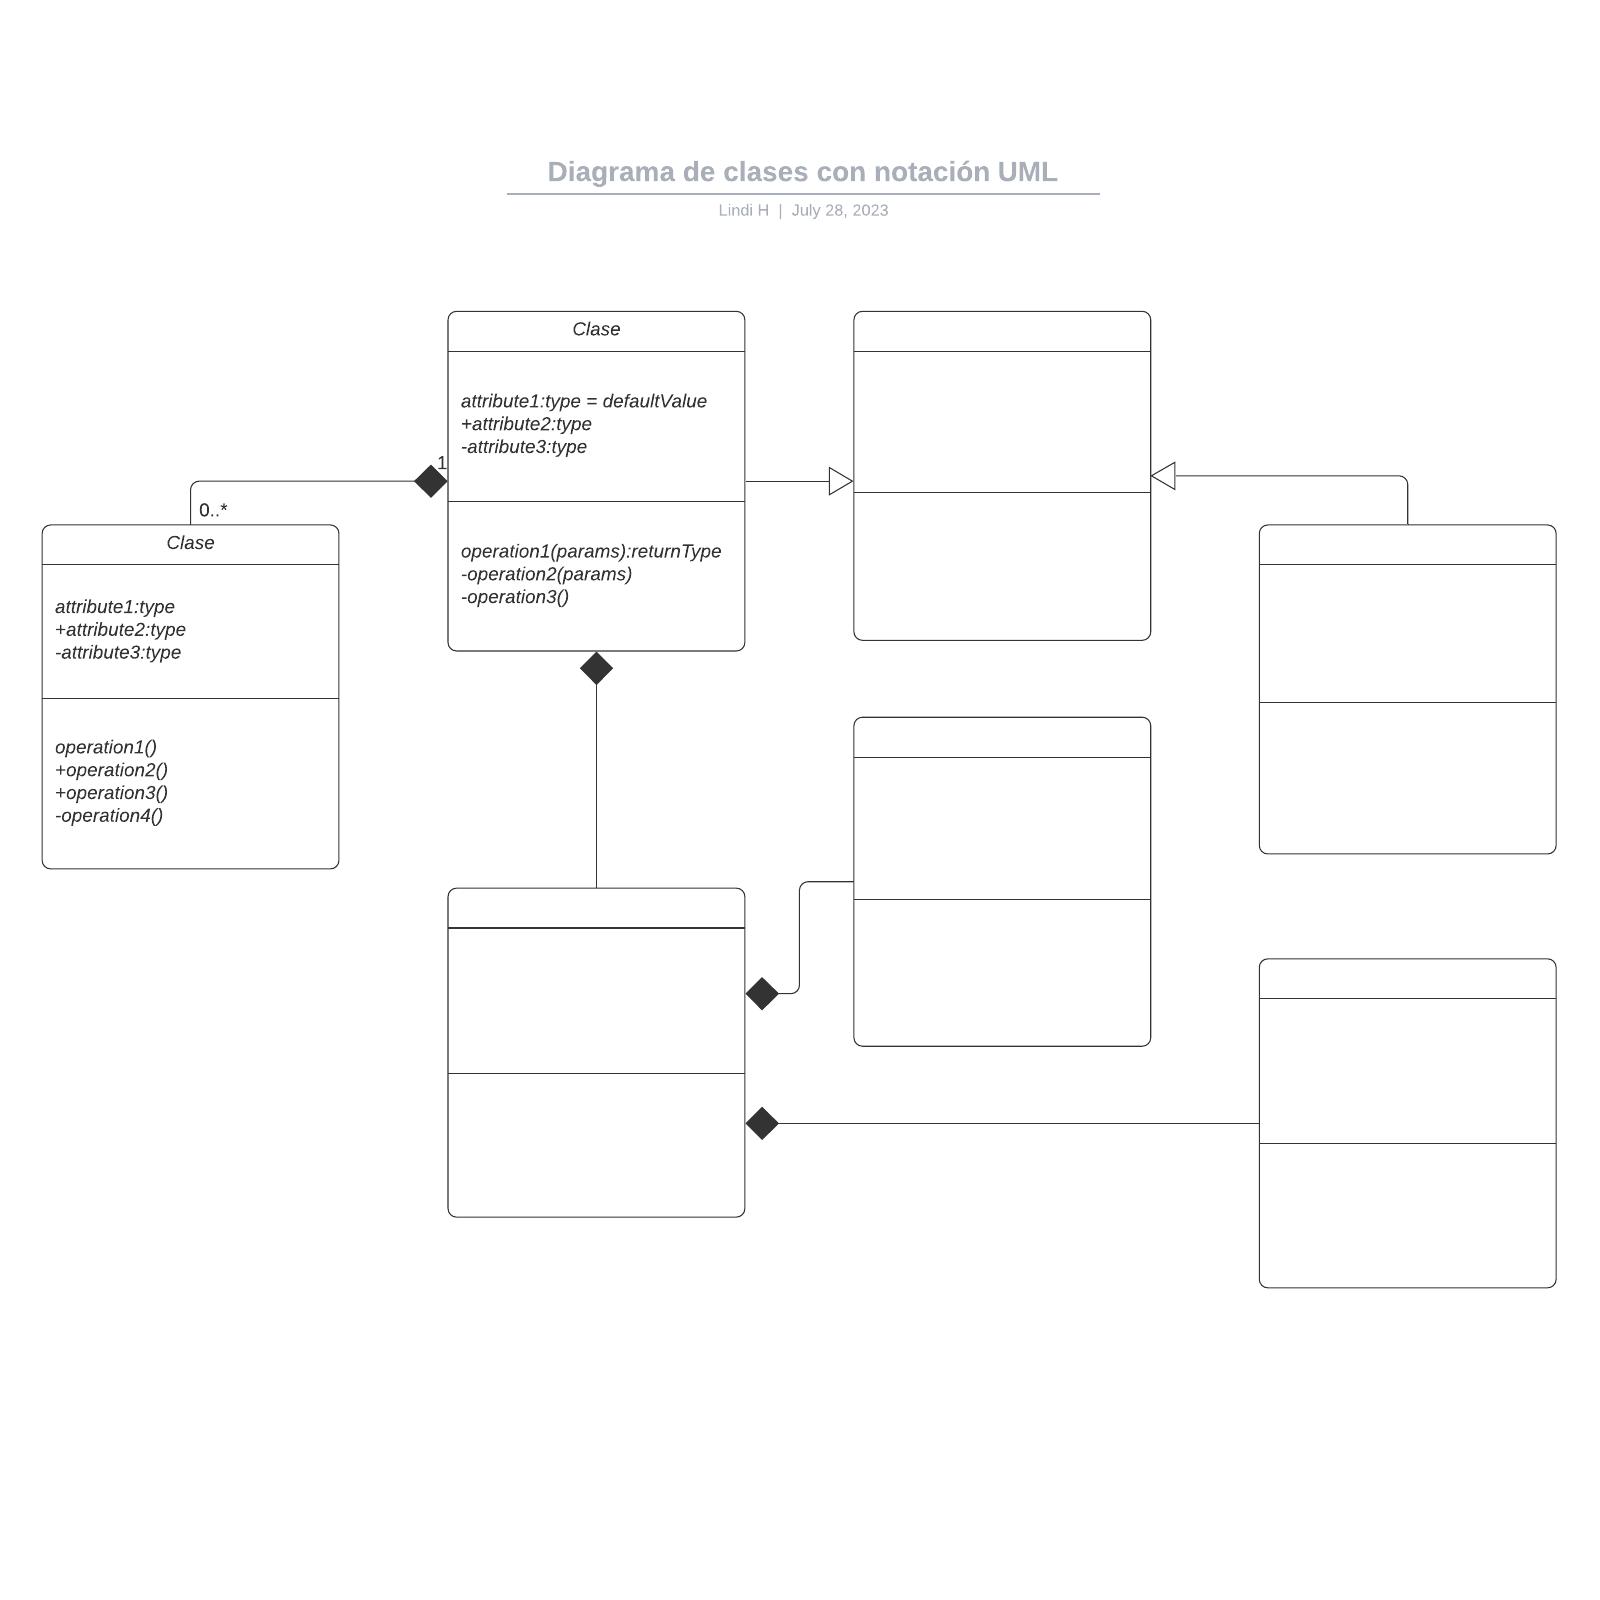 Diagrama de clases con notación UML